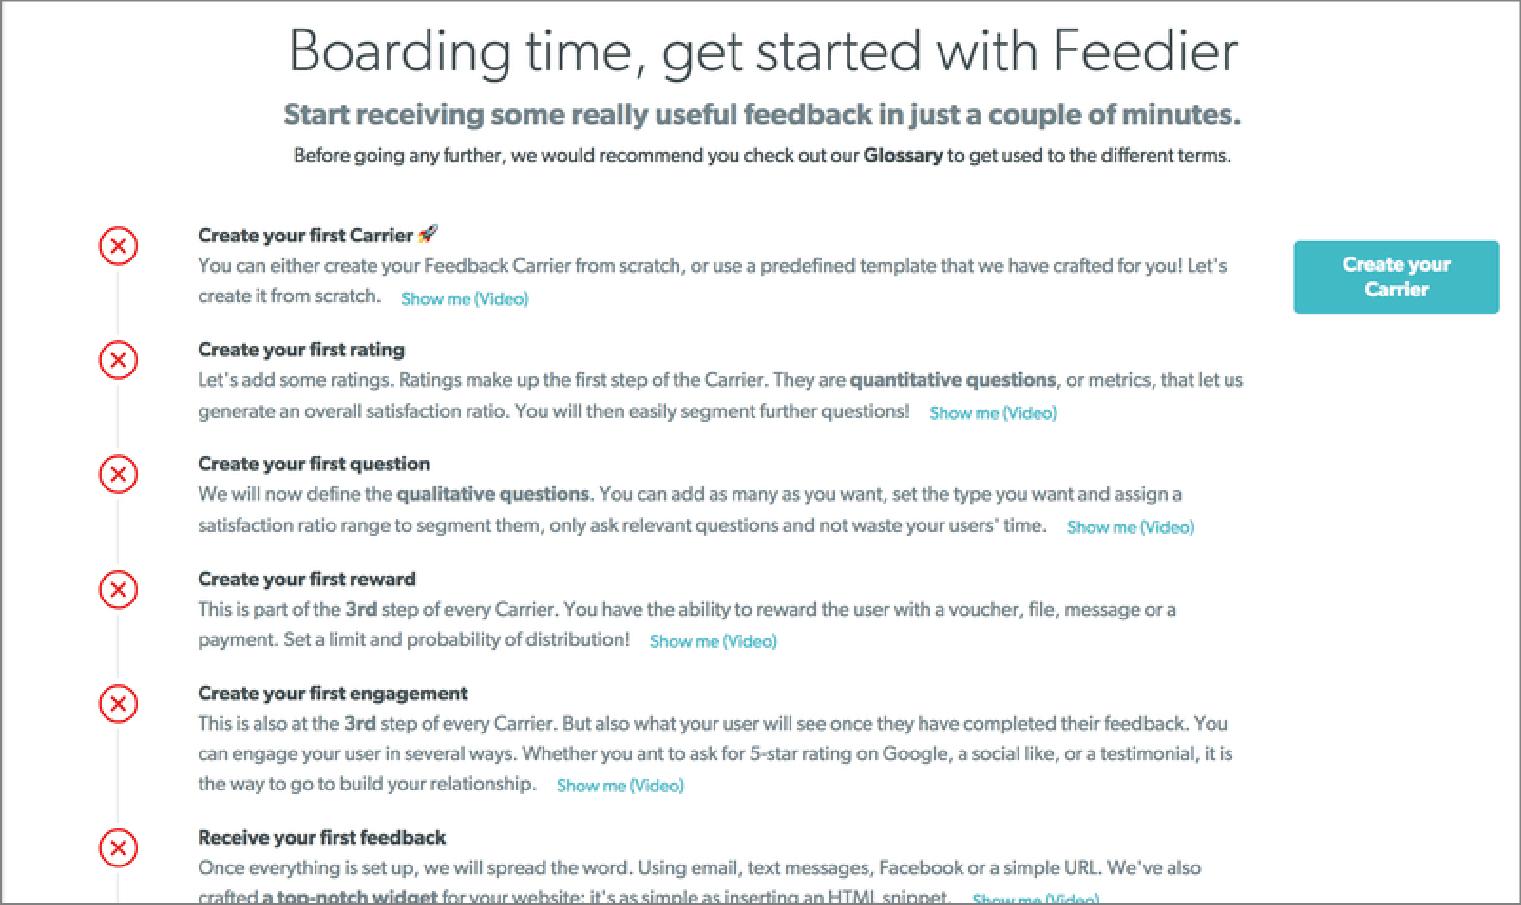 Feedier's Customer Onboarding Journey | WebEngage